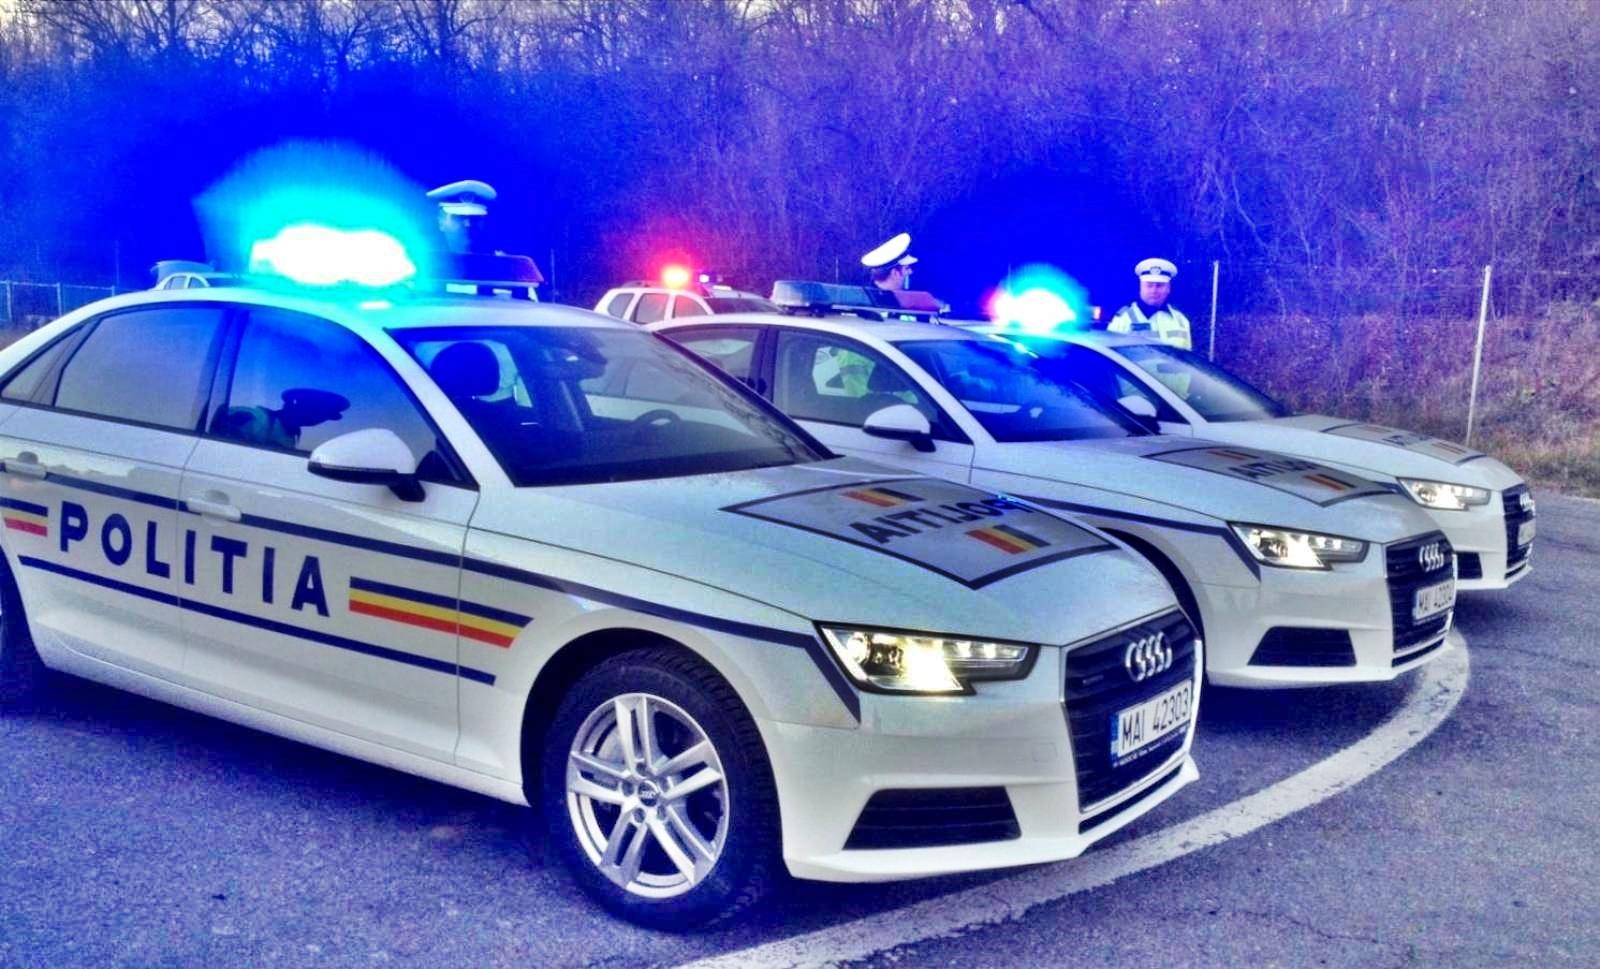 Politia Romana accident alcool